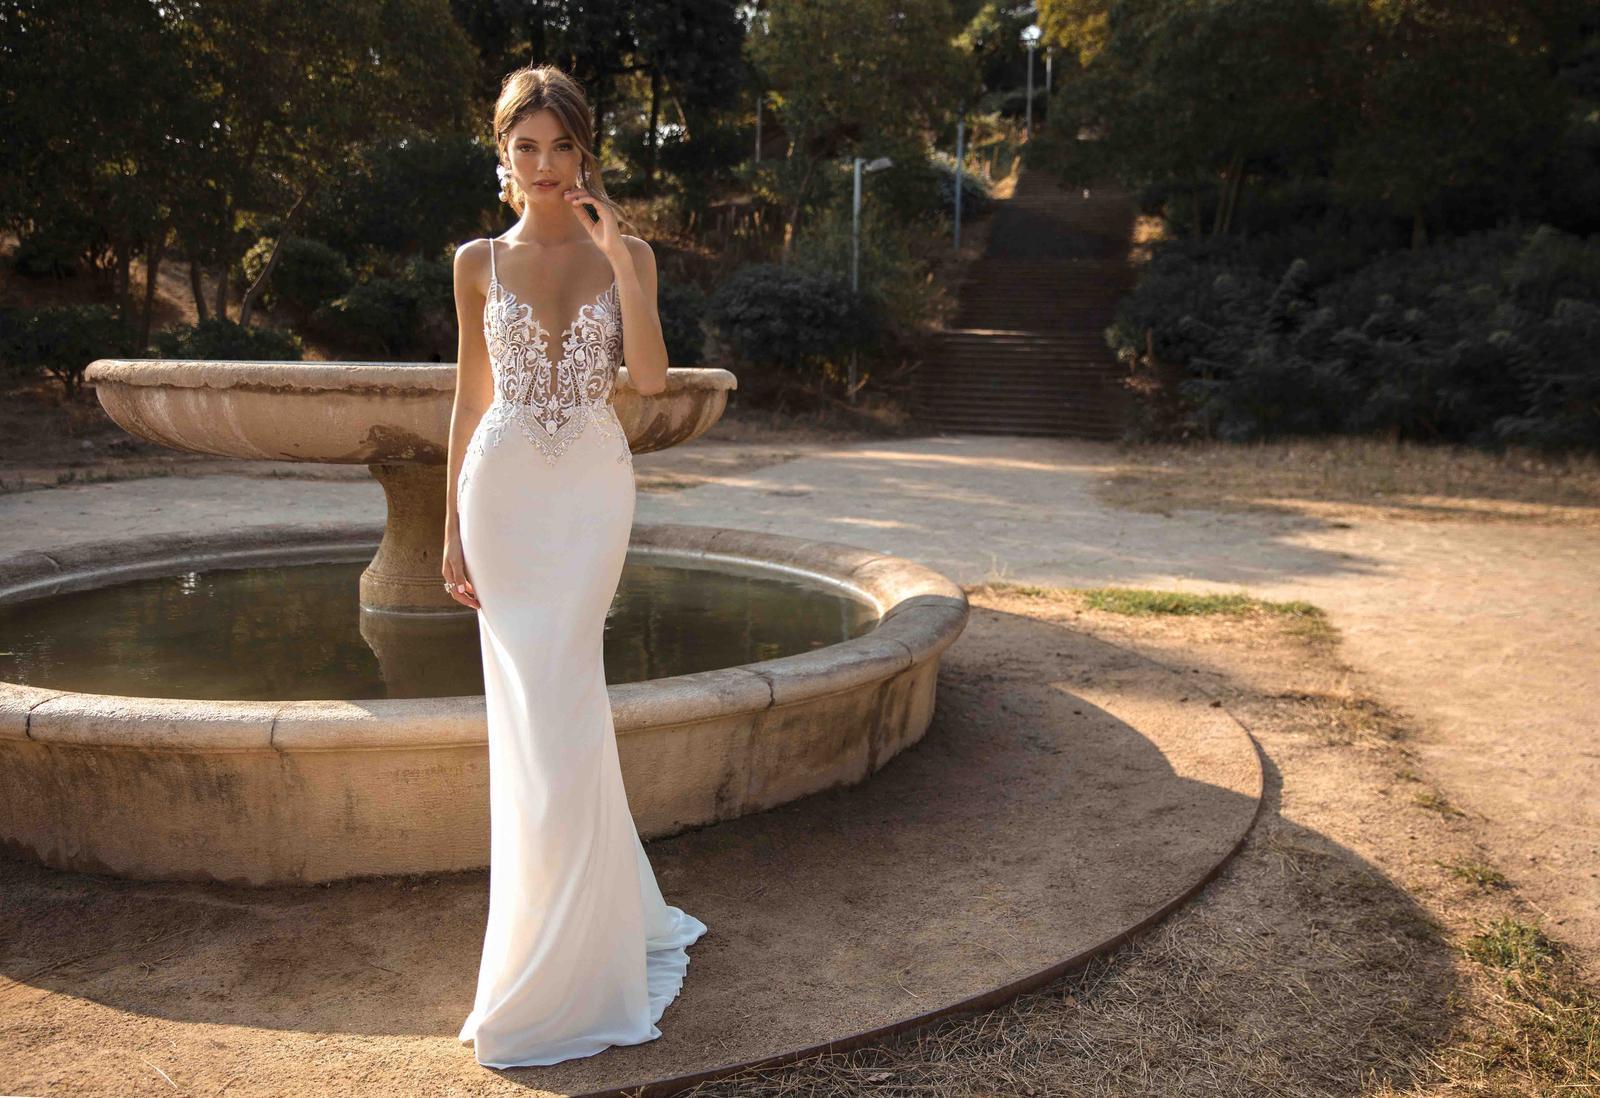 Muse by Berta * Svadobné šaty z kolekcií na rok 2019 - Obrázok č. 12